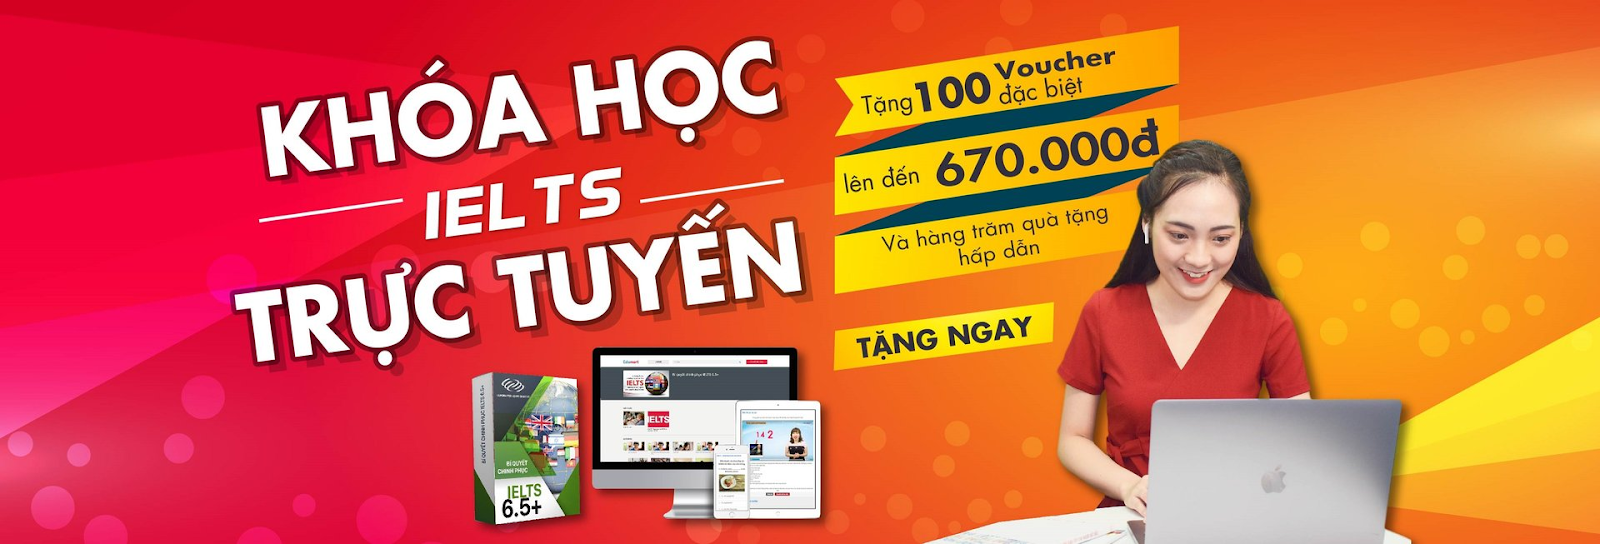 LangGo - Khoá học tiếng Anh IELTS online tốt nhất 2020